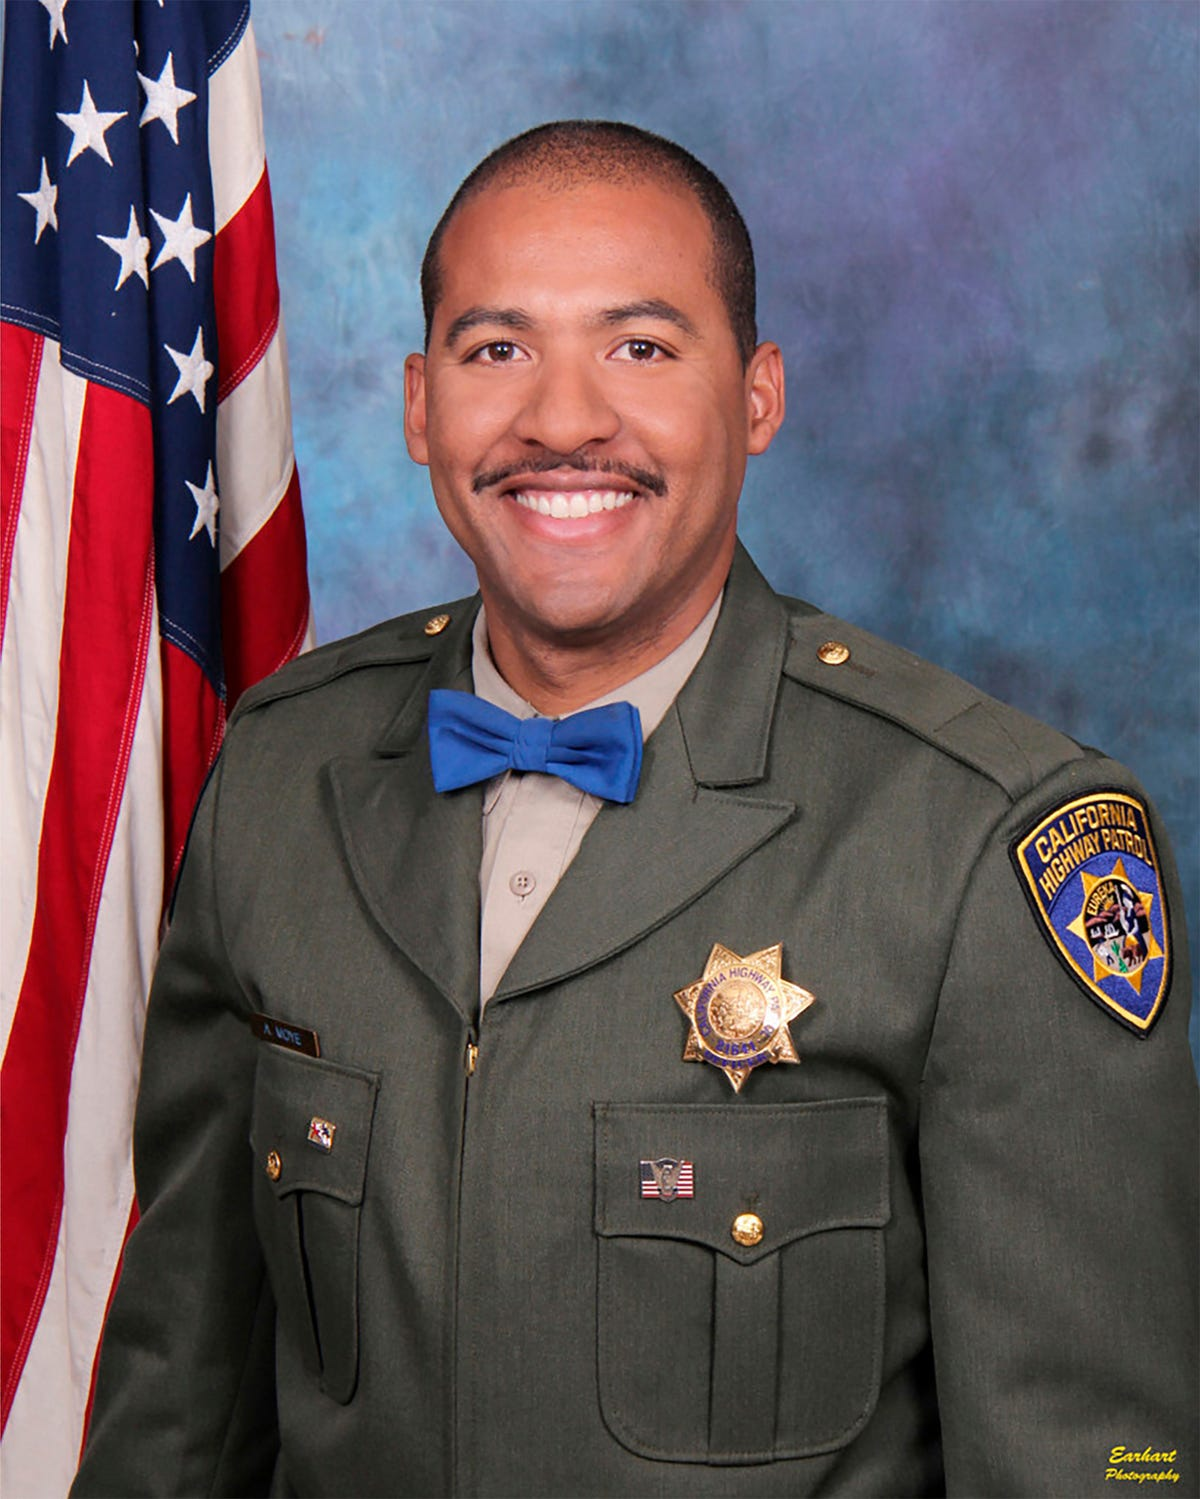 Riverside shooting: California Highway Patrol officer killed